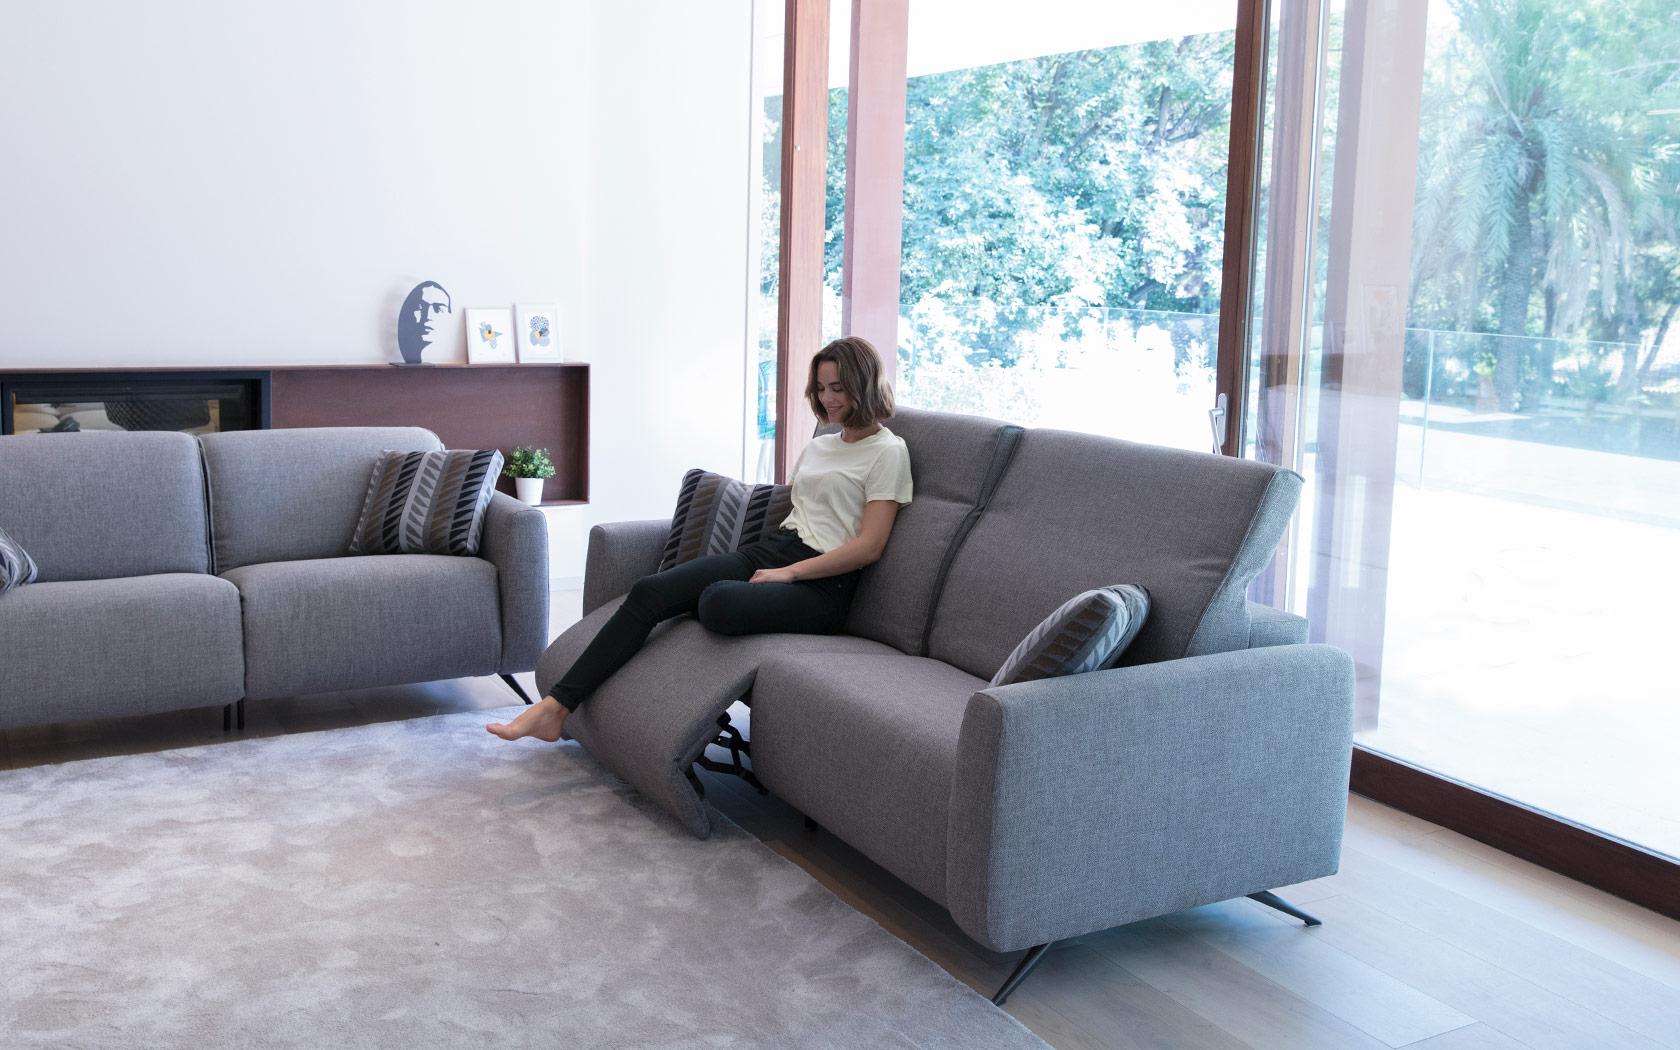 Baltia sofa relax 2020 06